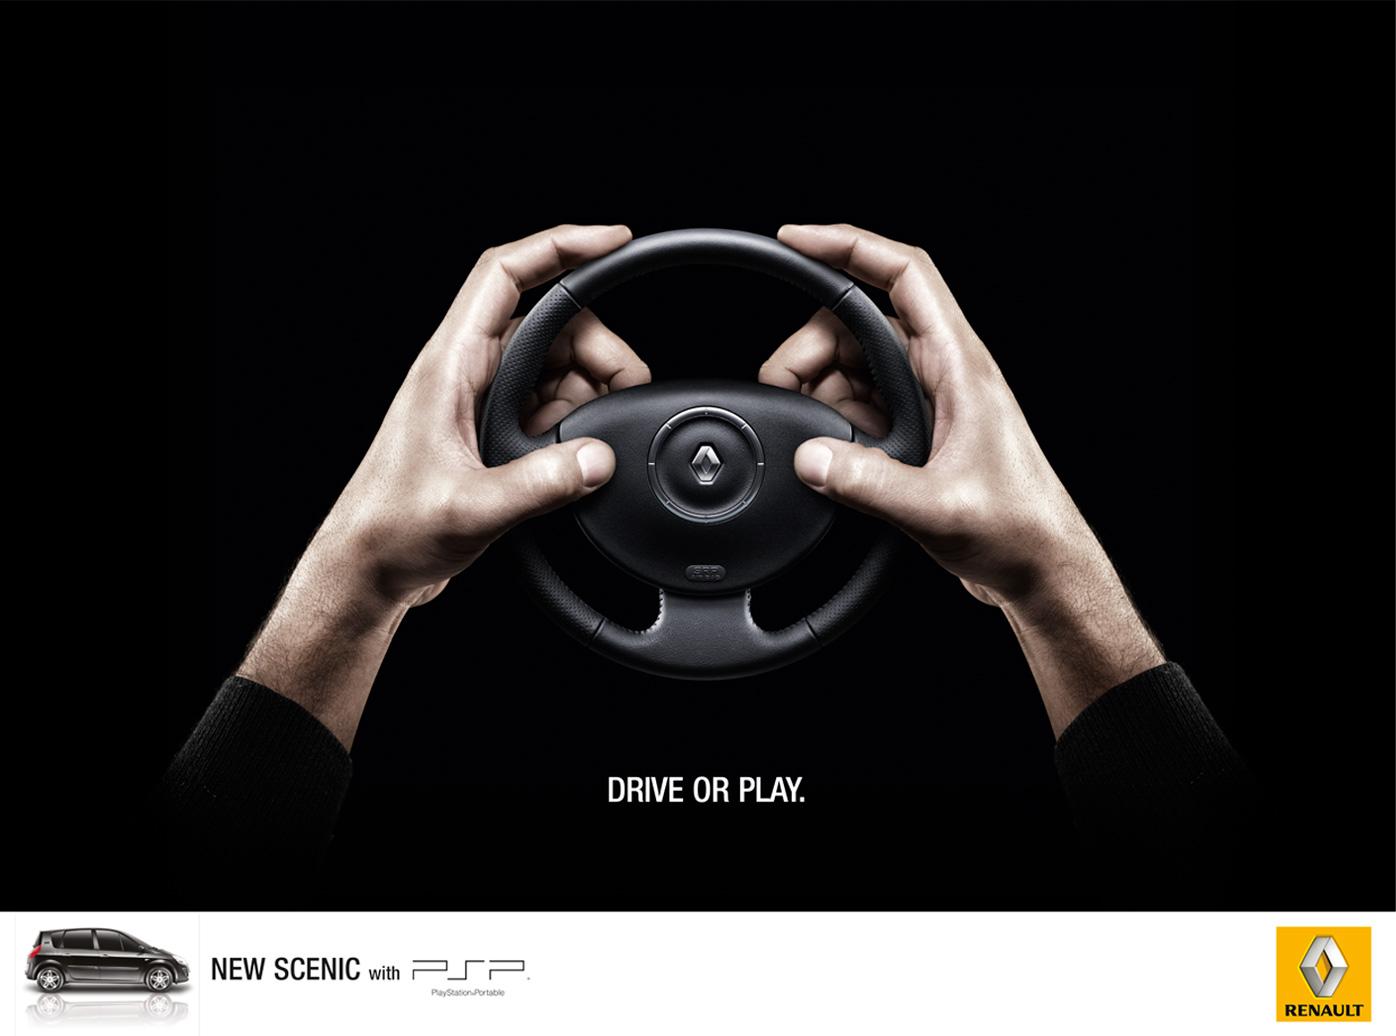 RenaultDriveOrPlay